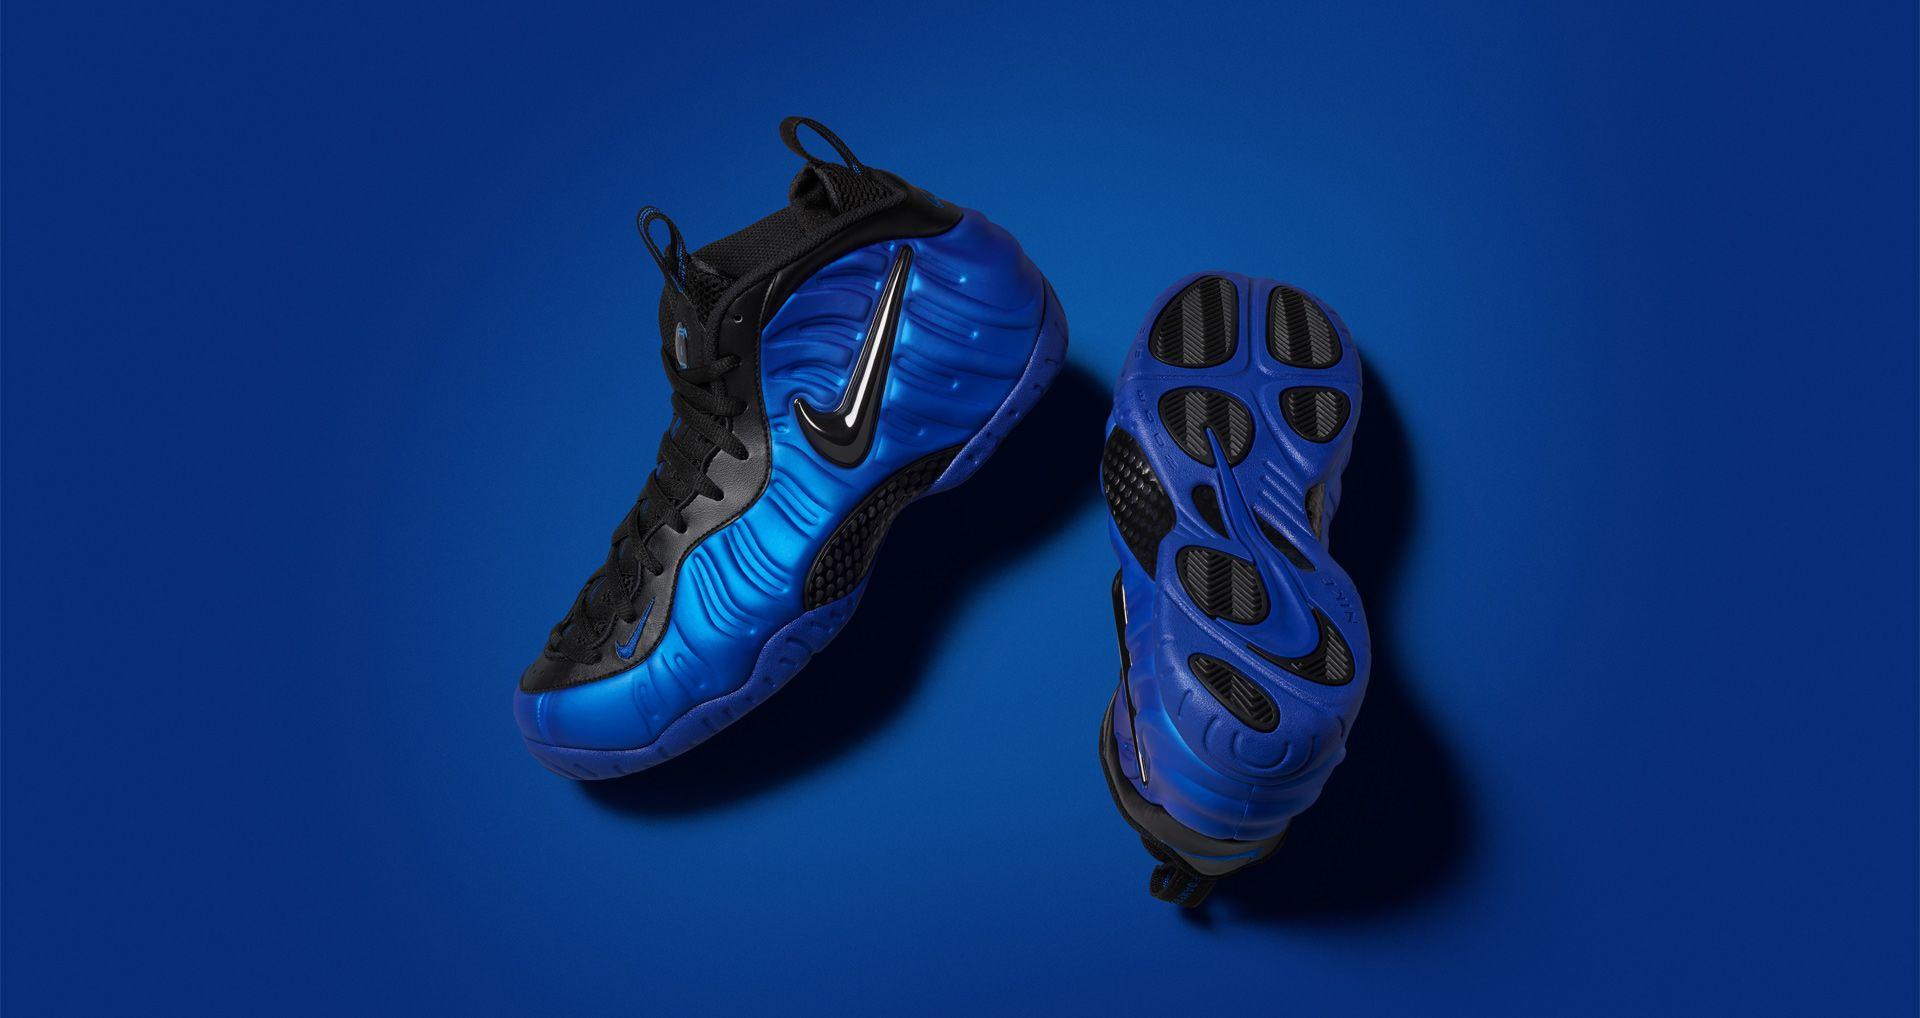 aa9fa51c3fd Nike Air Foamposite Pro  Hyper Cobalt  Release Date. Nike+ SNKRS